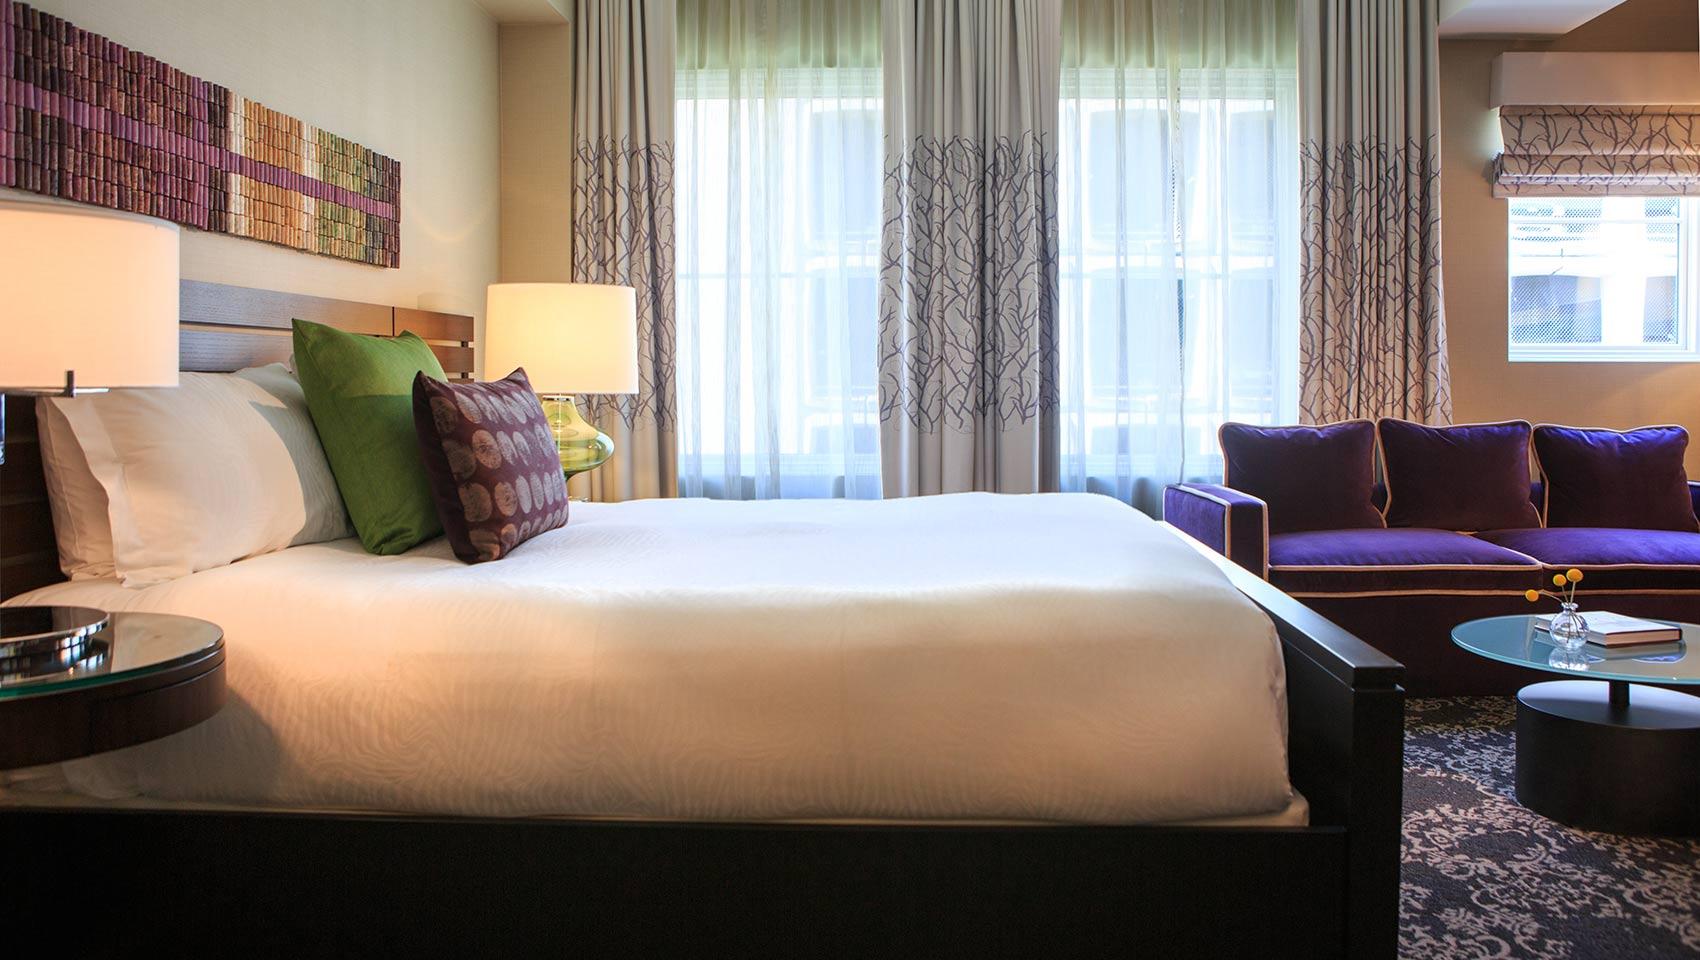 Hotels Downtown Seattle | Kimpton Hotel Vintage Seattle